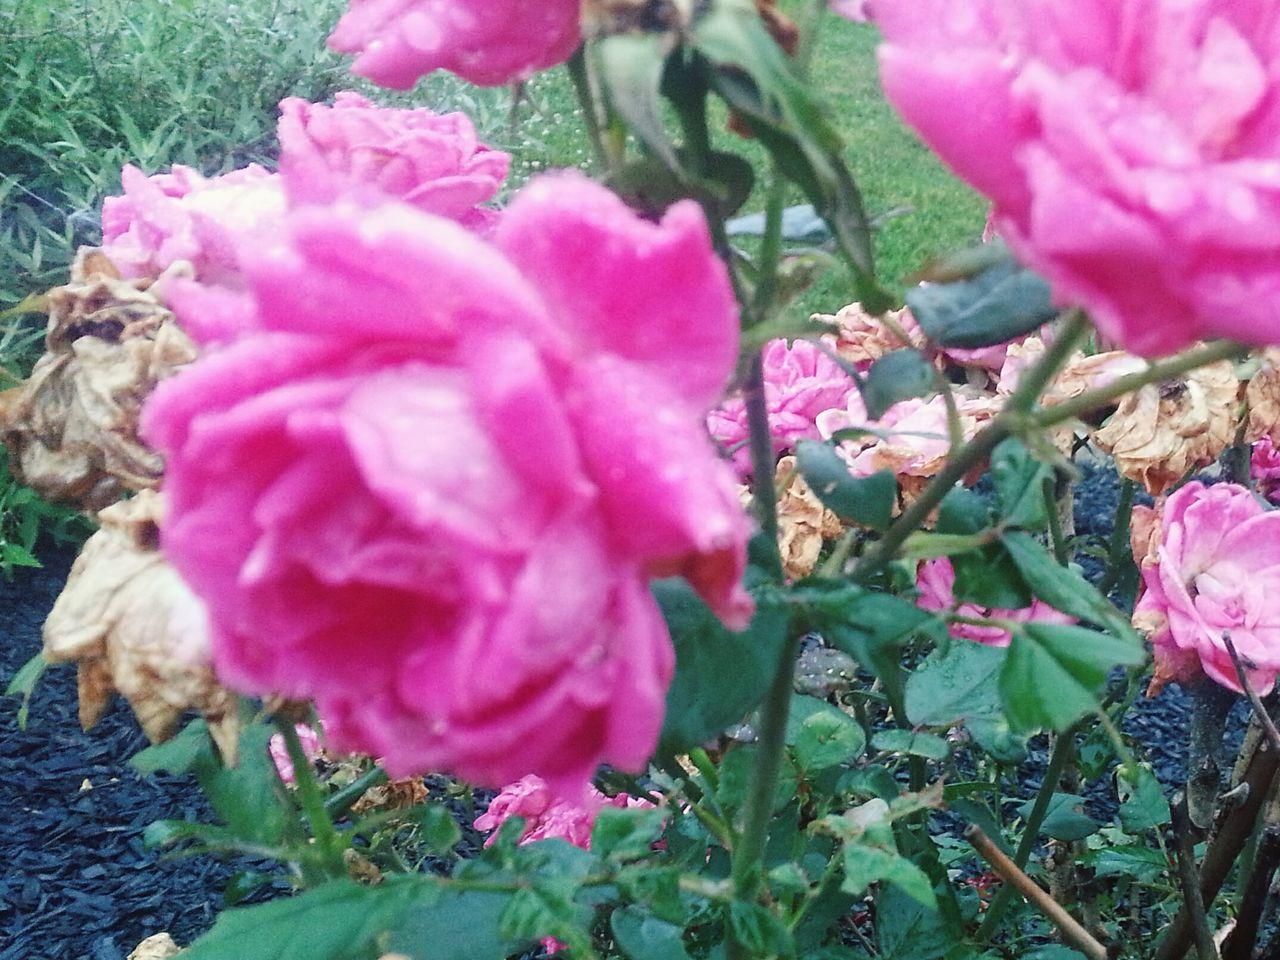 Intothewoods Hallelujah My Lovely  Flowers